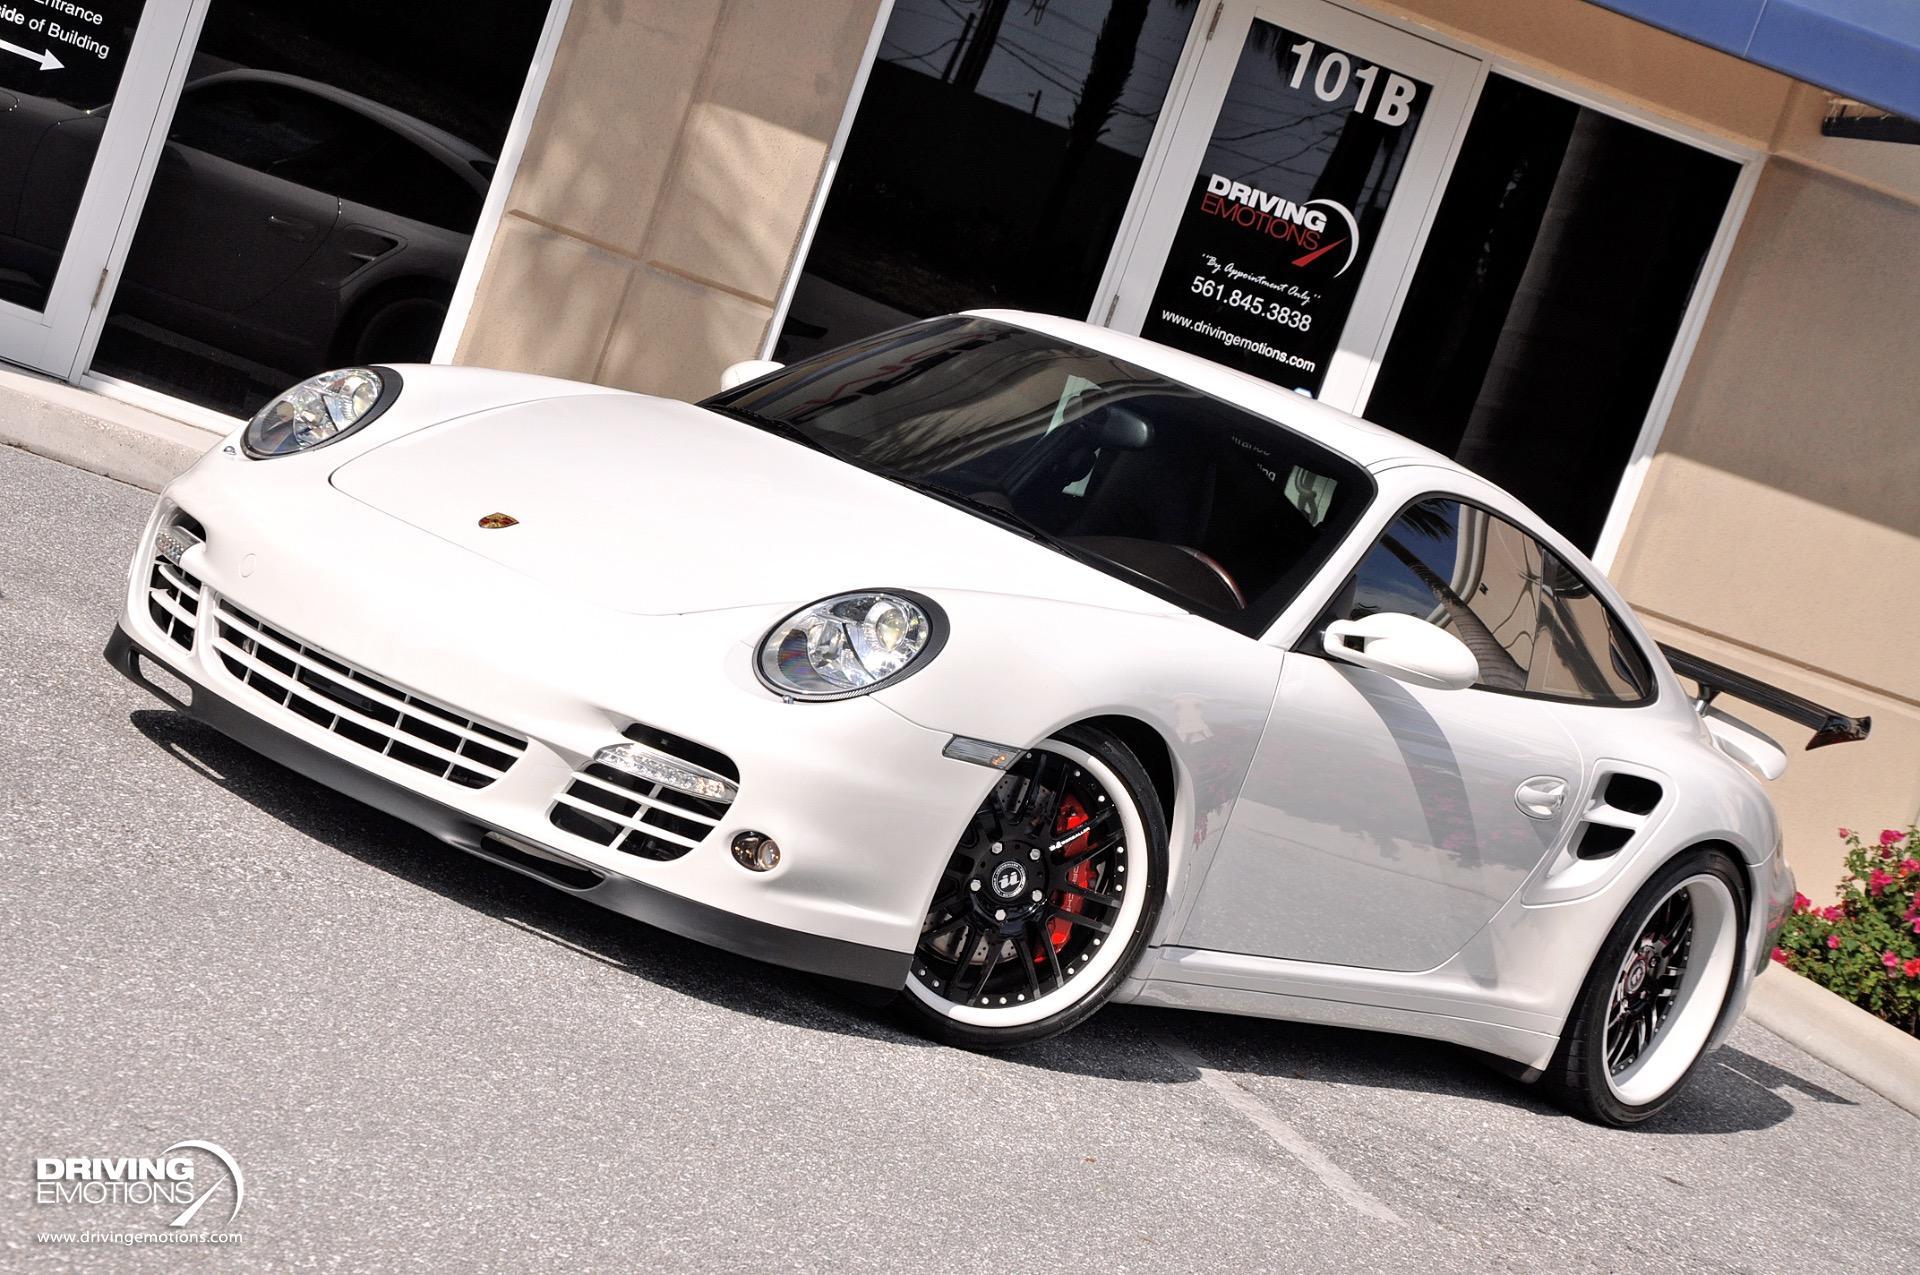 Used 2008 Porsche 911 Turbo Champion Werks 1 Turbo Coupe 6-Speed Manual!! Werks 1!   Lake Park, FL